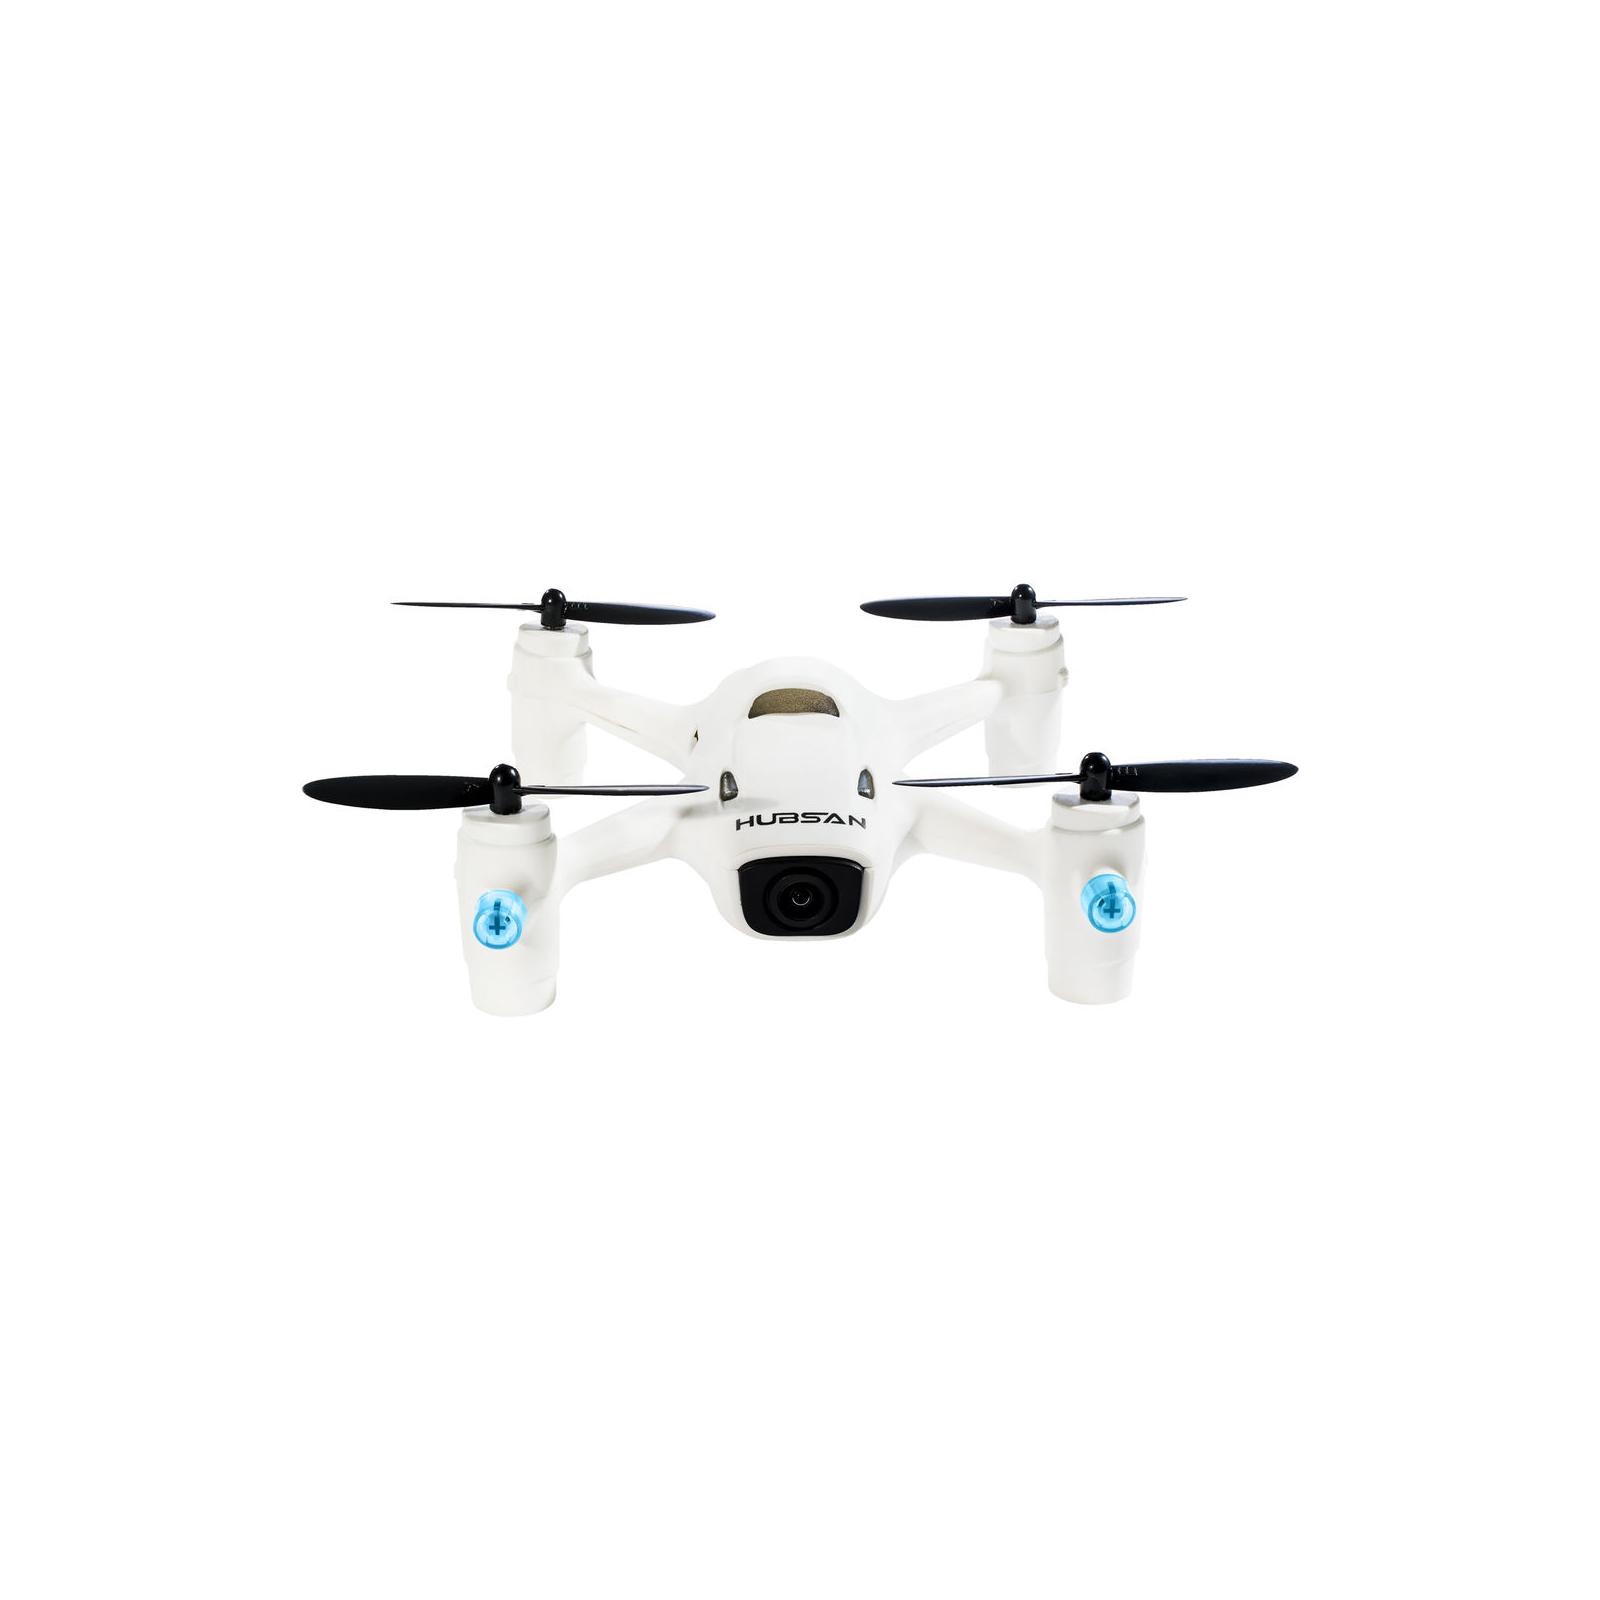 Квадрокоптер Hubsan H107C+ X4 2.4ГГц 4CH RC белый (H107C+ White HD Camera) изображение 5